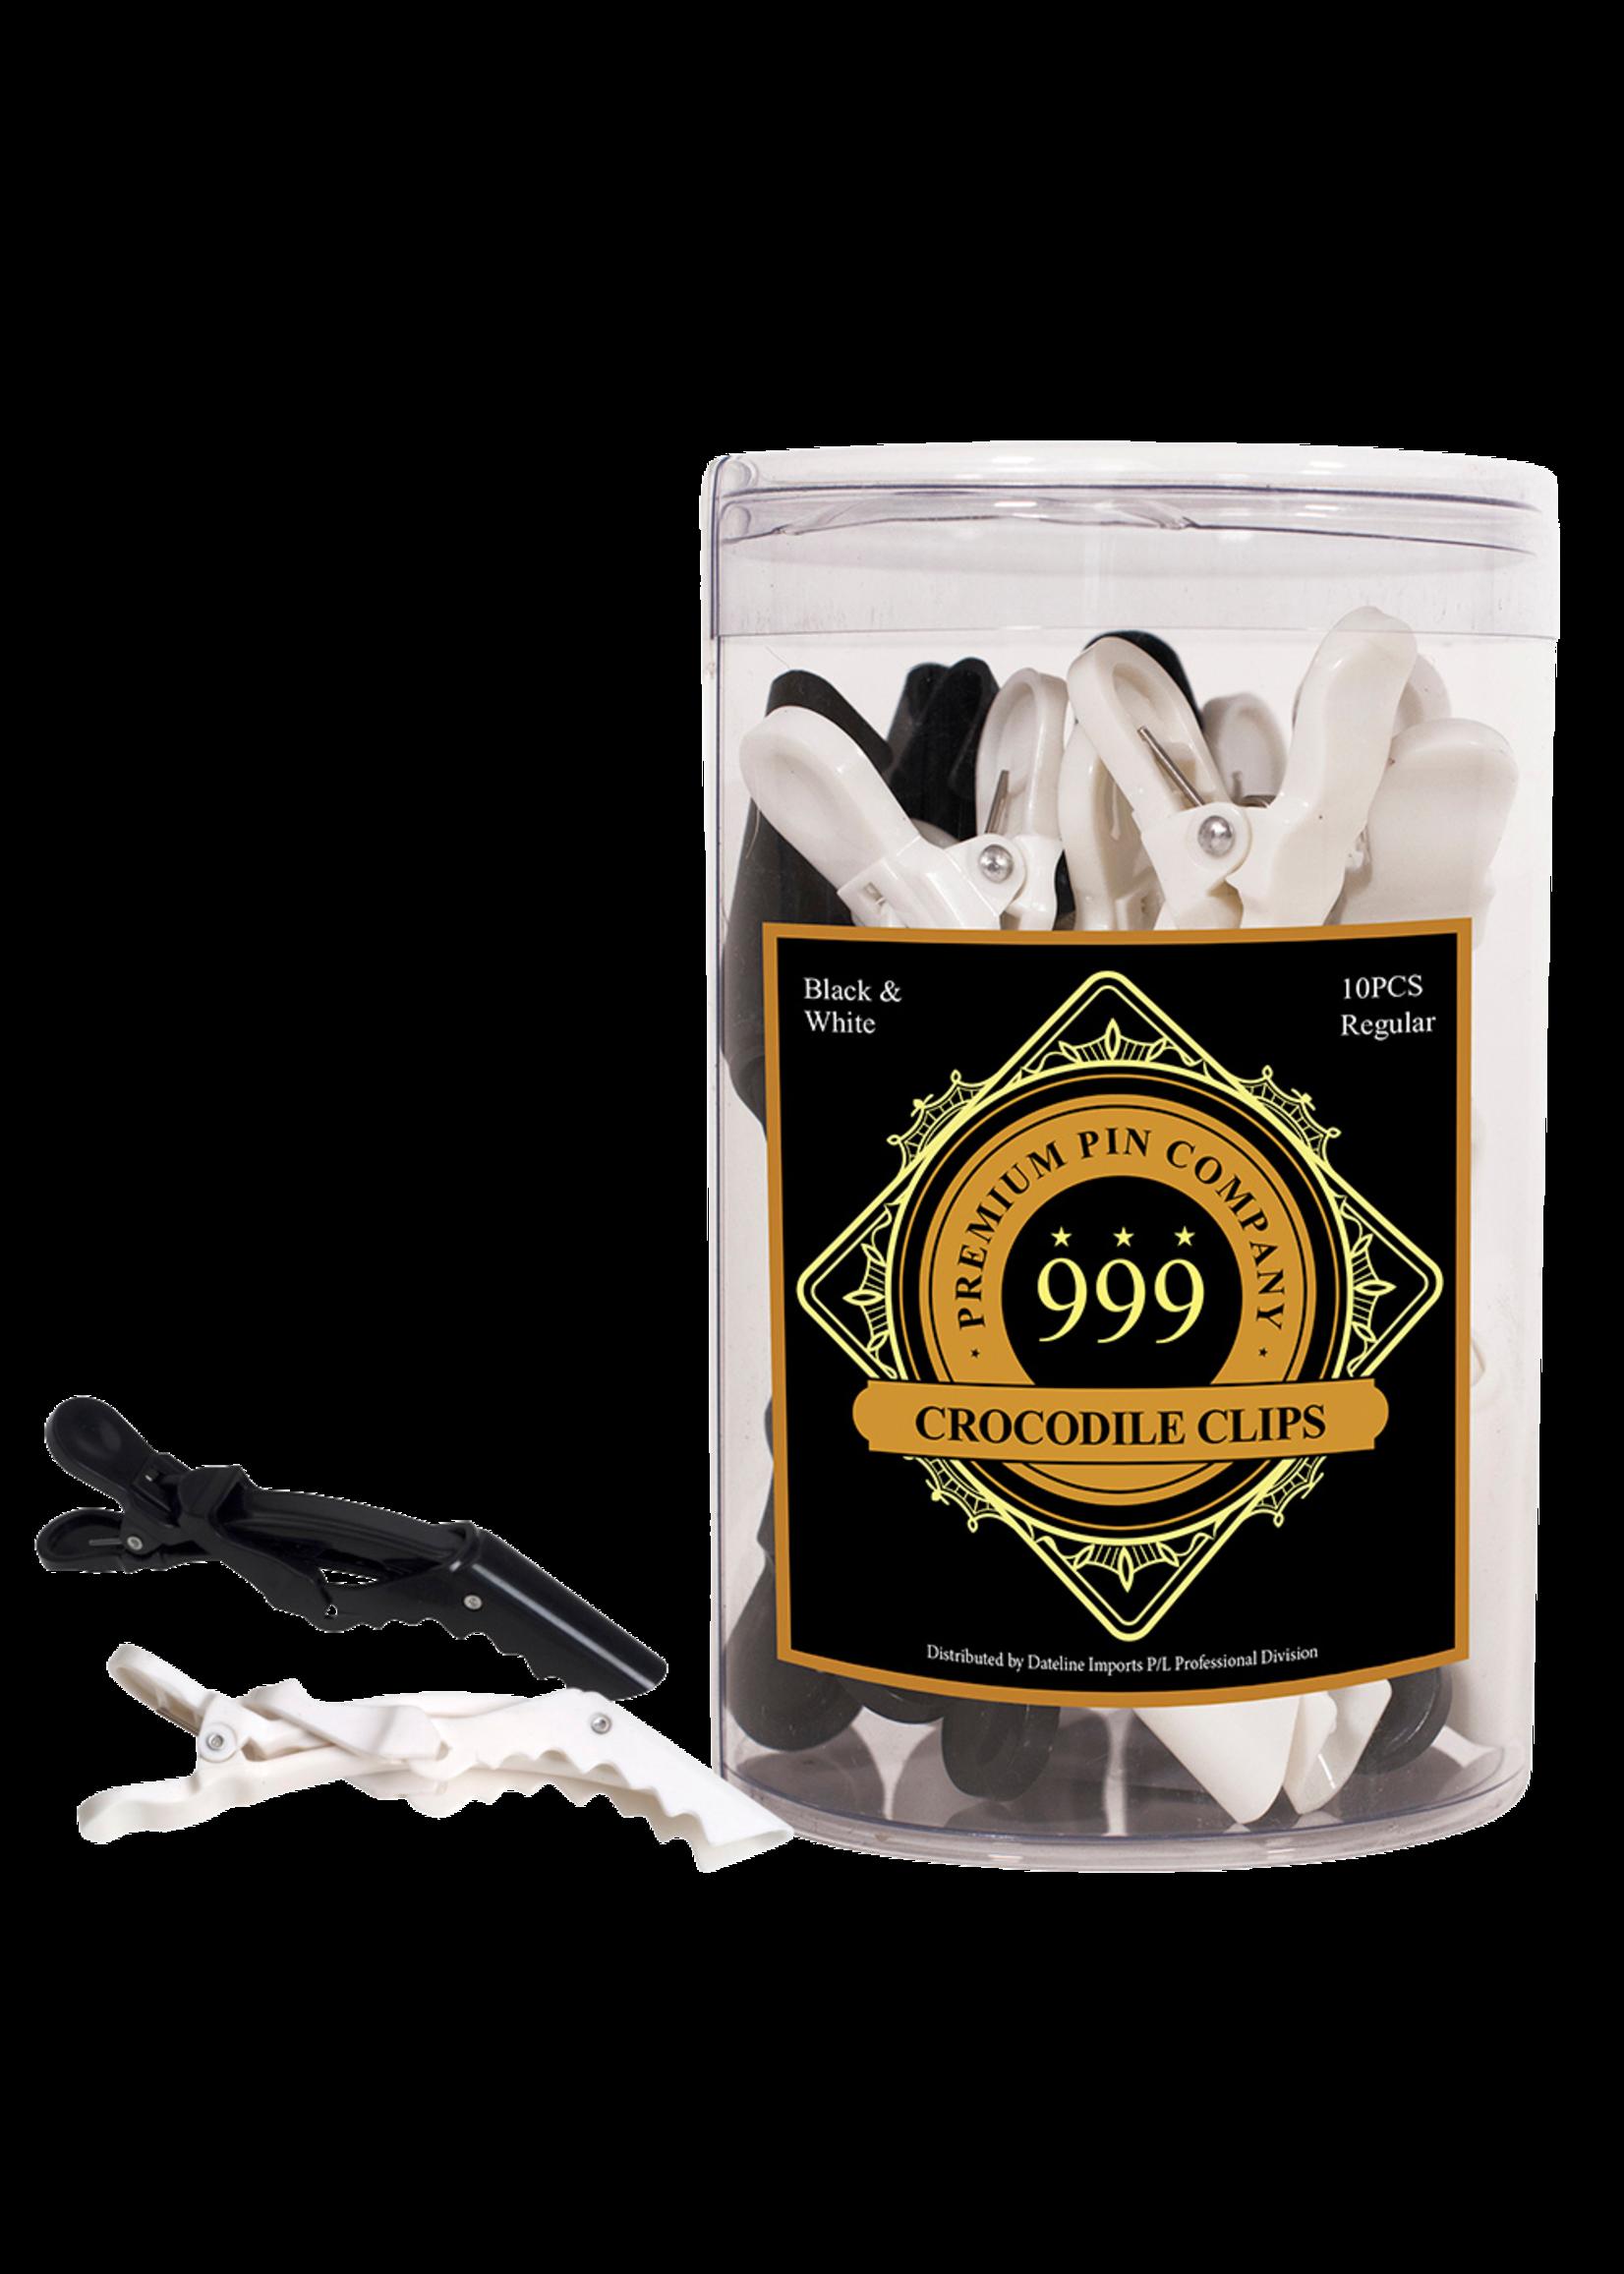 999 Premium Pin Company 999 Crocodile Clips Large Black & White Tub 10pcs